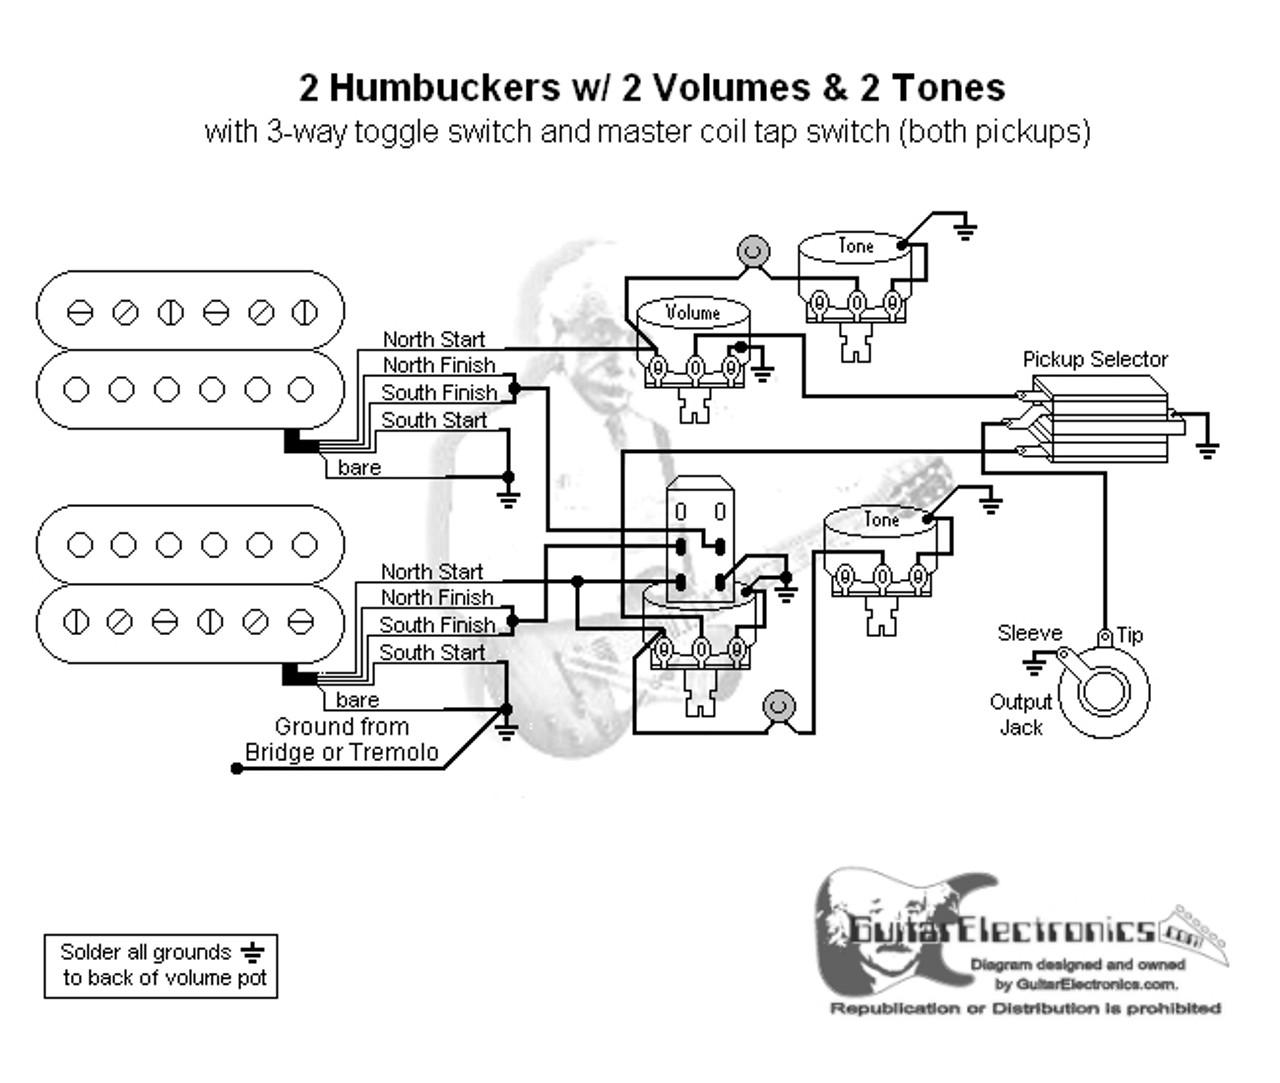 coil tap dimarzio wiring diagrams wiring diagram table 2 Humbucker Wiring Diagrams